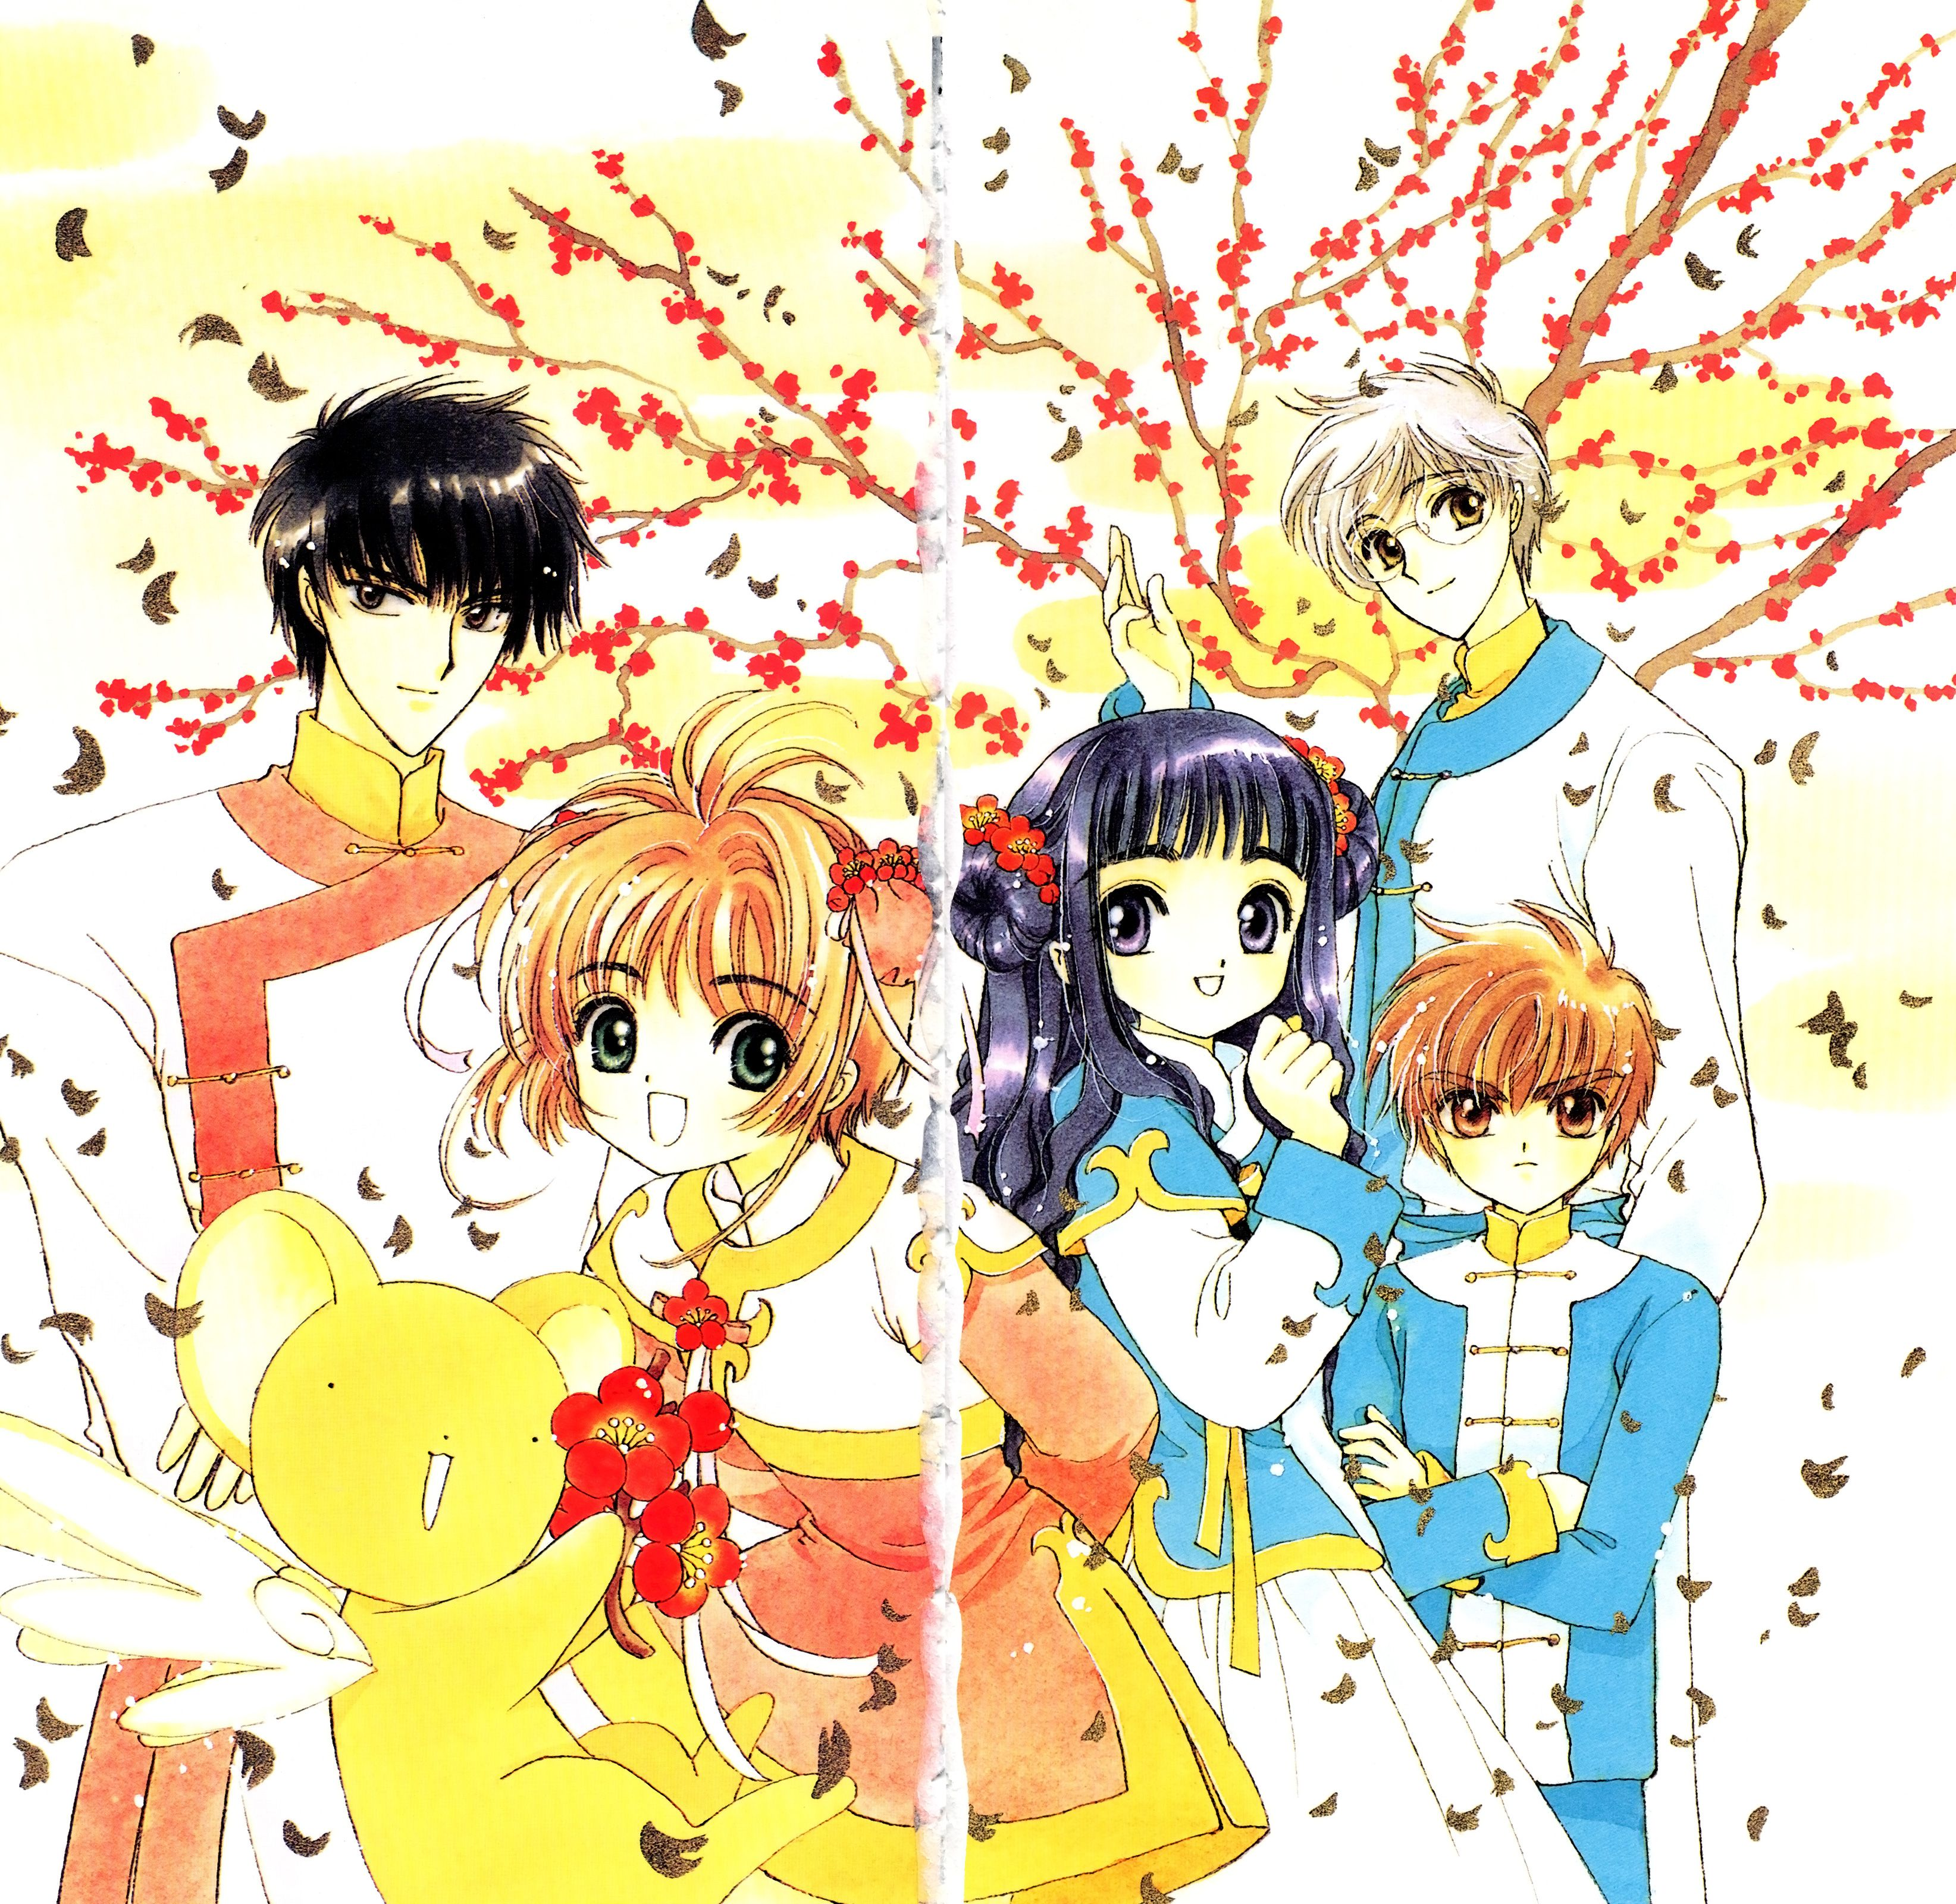 CLAMP, Cardcaptor Sakura, Cardcaptor Sakura Illustrations Collection 3, Daidouji Tomoyo, Kero-chan, Kinomoto Touya